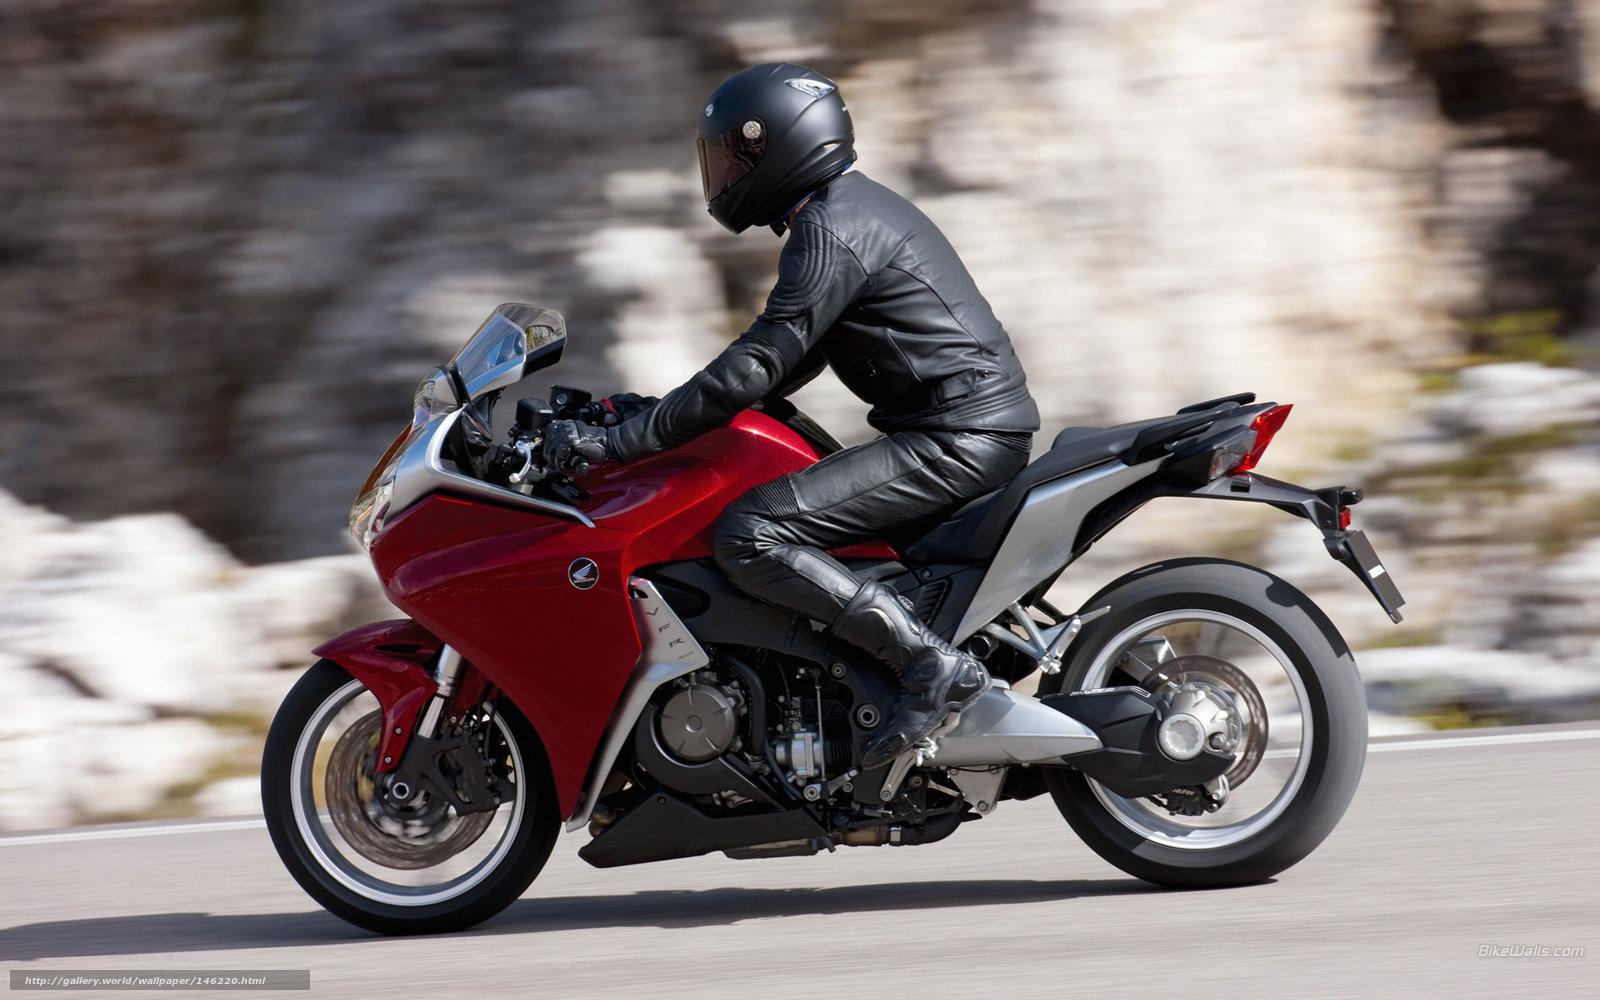 Фото мотоцикла homa f5 3 фотография